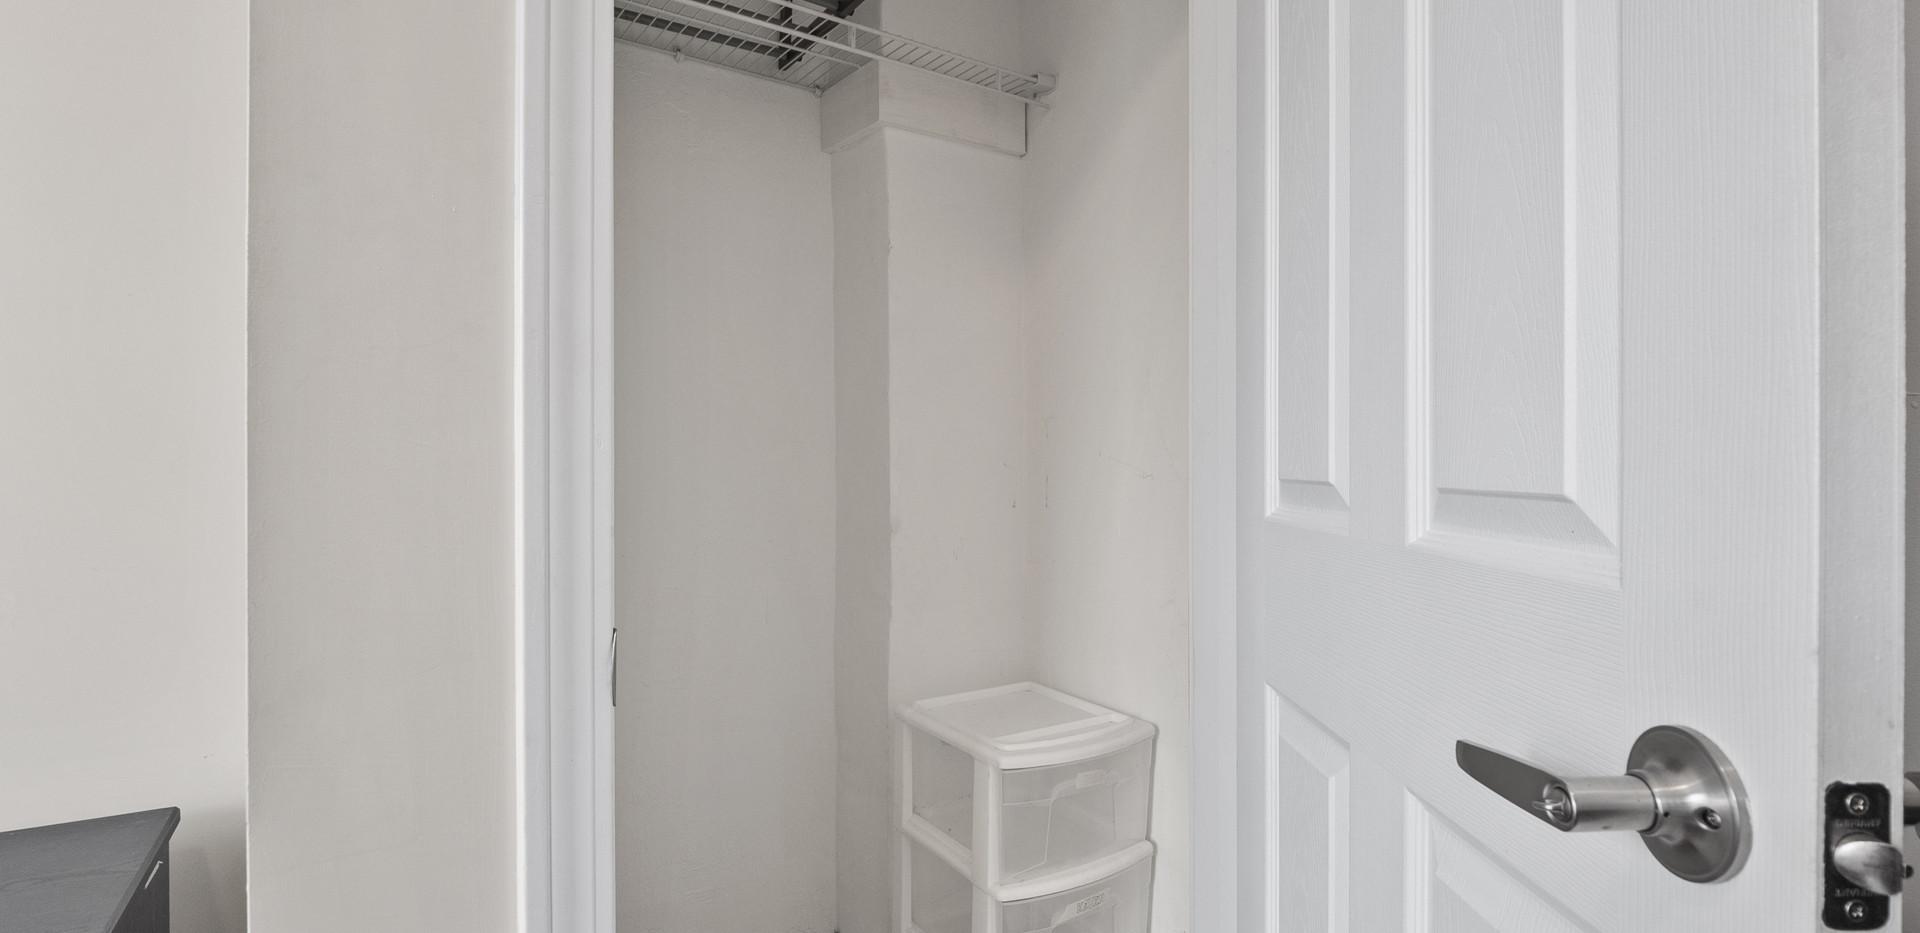 Bedroom B Closet at 32 Shelby Unit 2